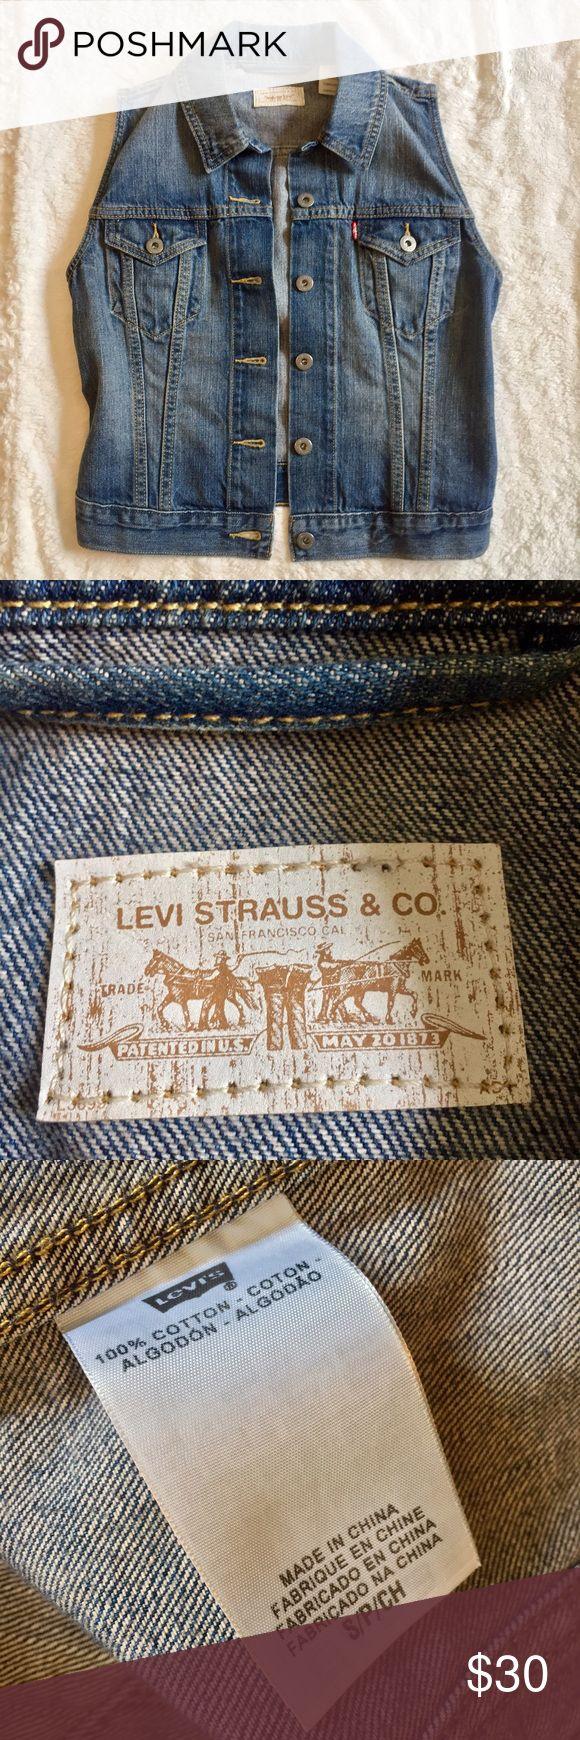 Levi's Vest • Levi's denim vest • Features Levi's trademark tag on upper right pocket  • Adjustable back buttons  • 100% cotton Levi's Jackets & Coats Vests